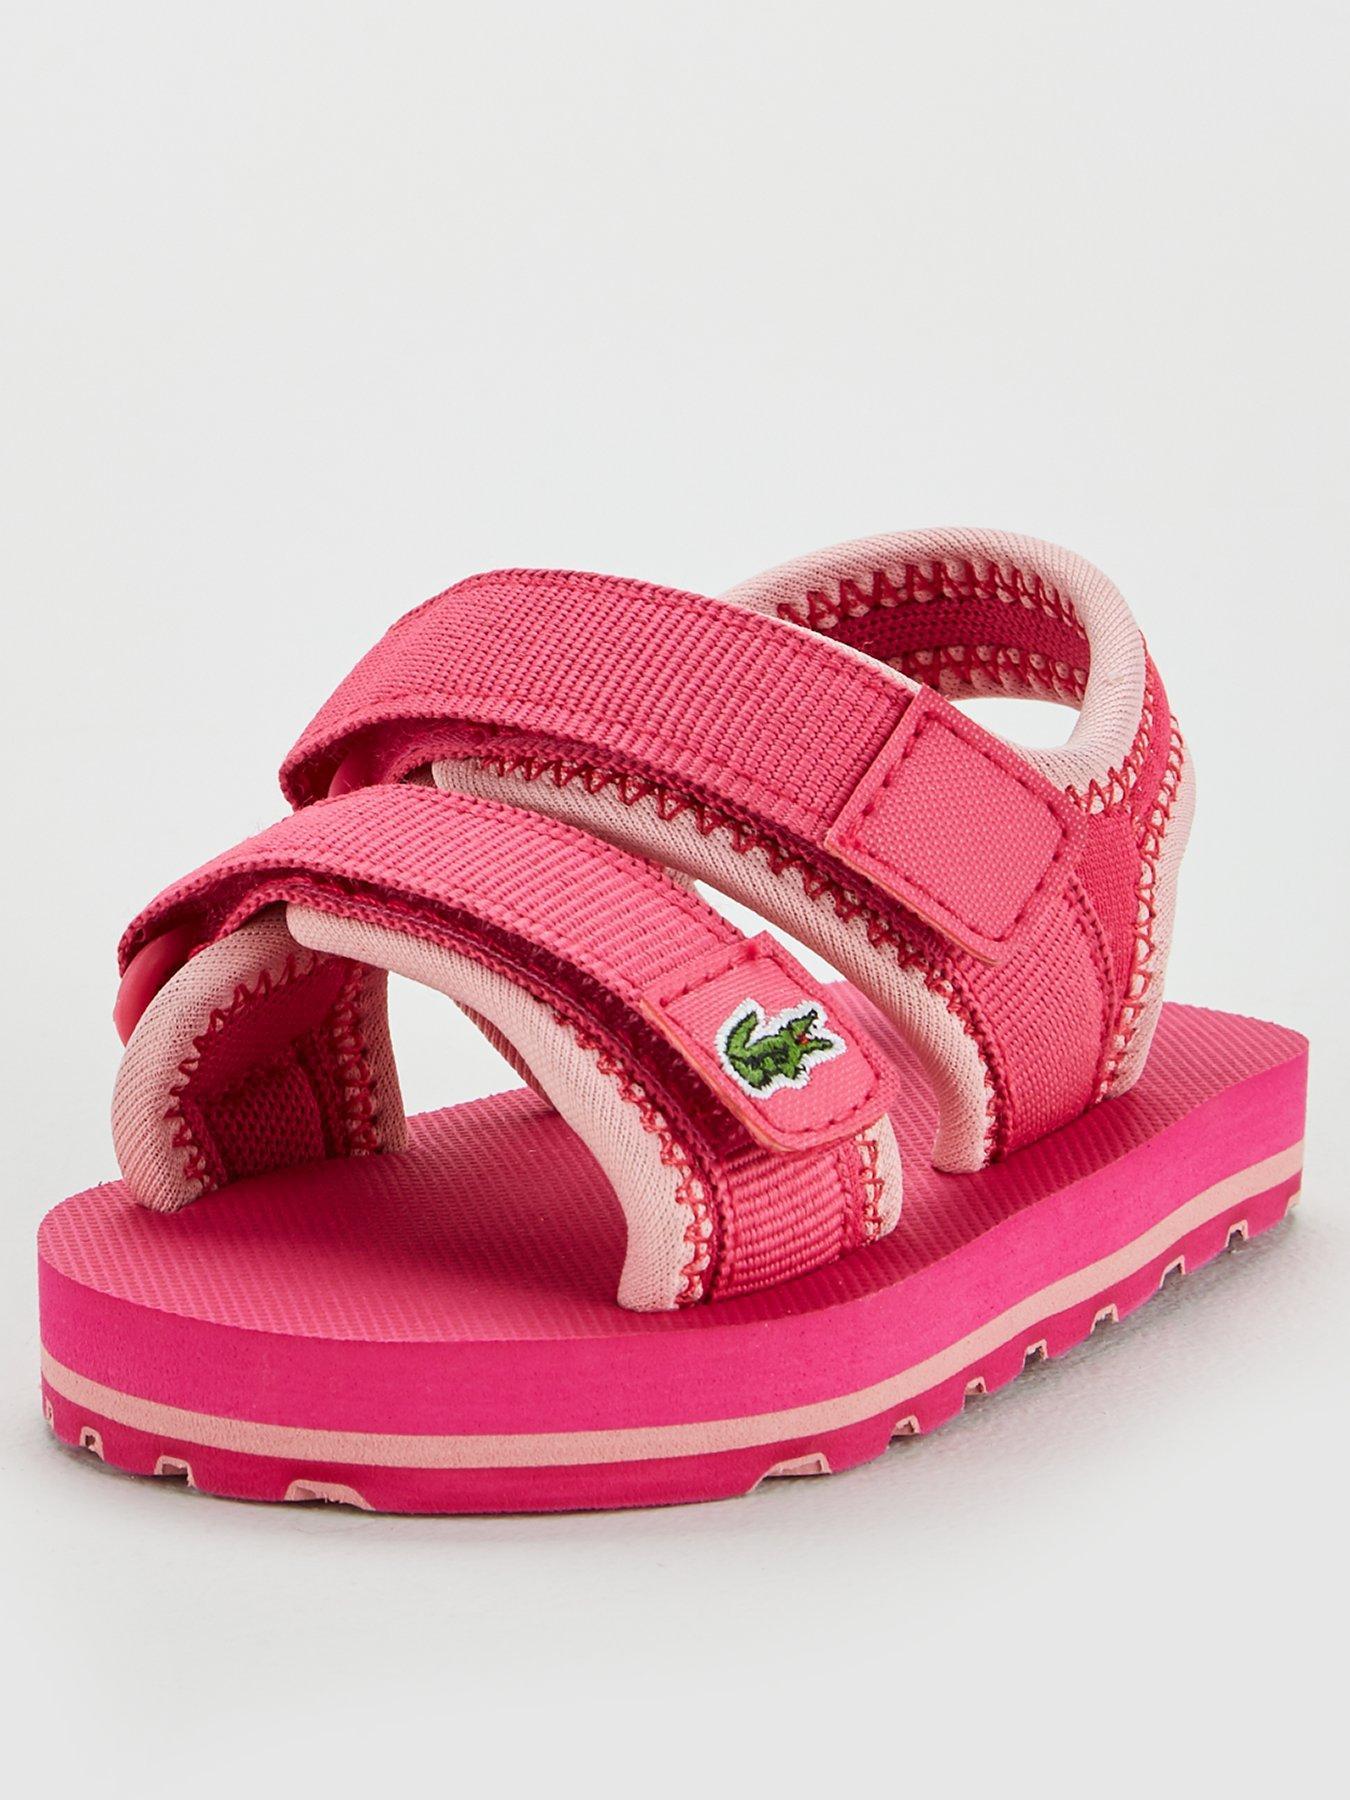 709 Girls Baby Pram Sandals Pink and Yellow